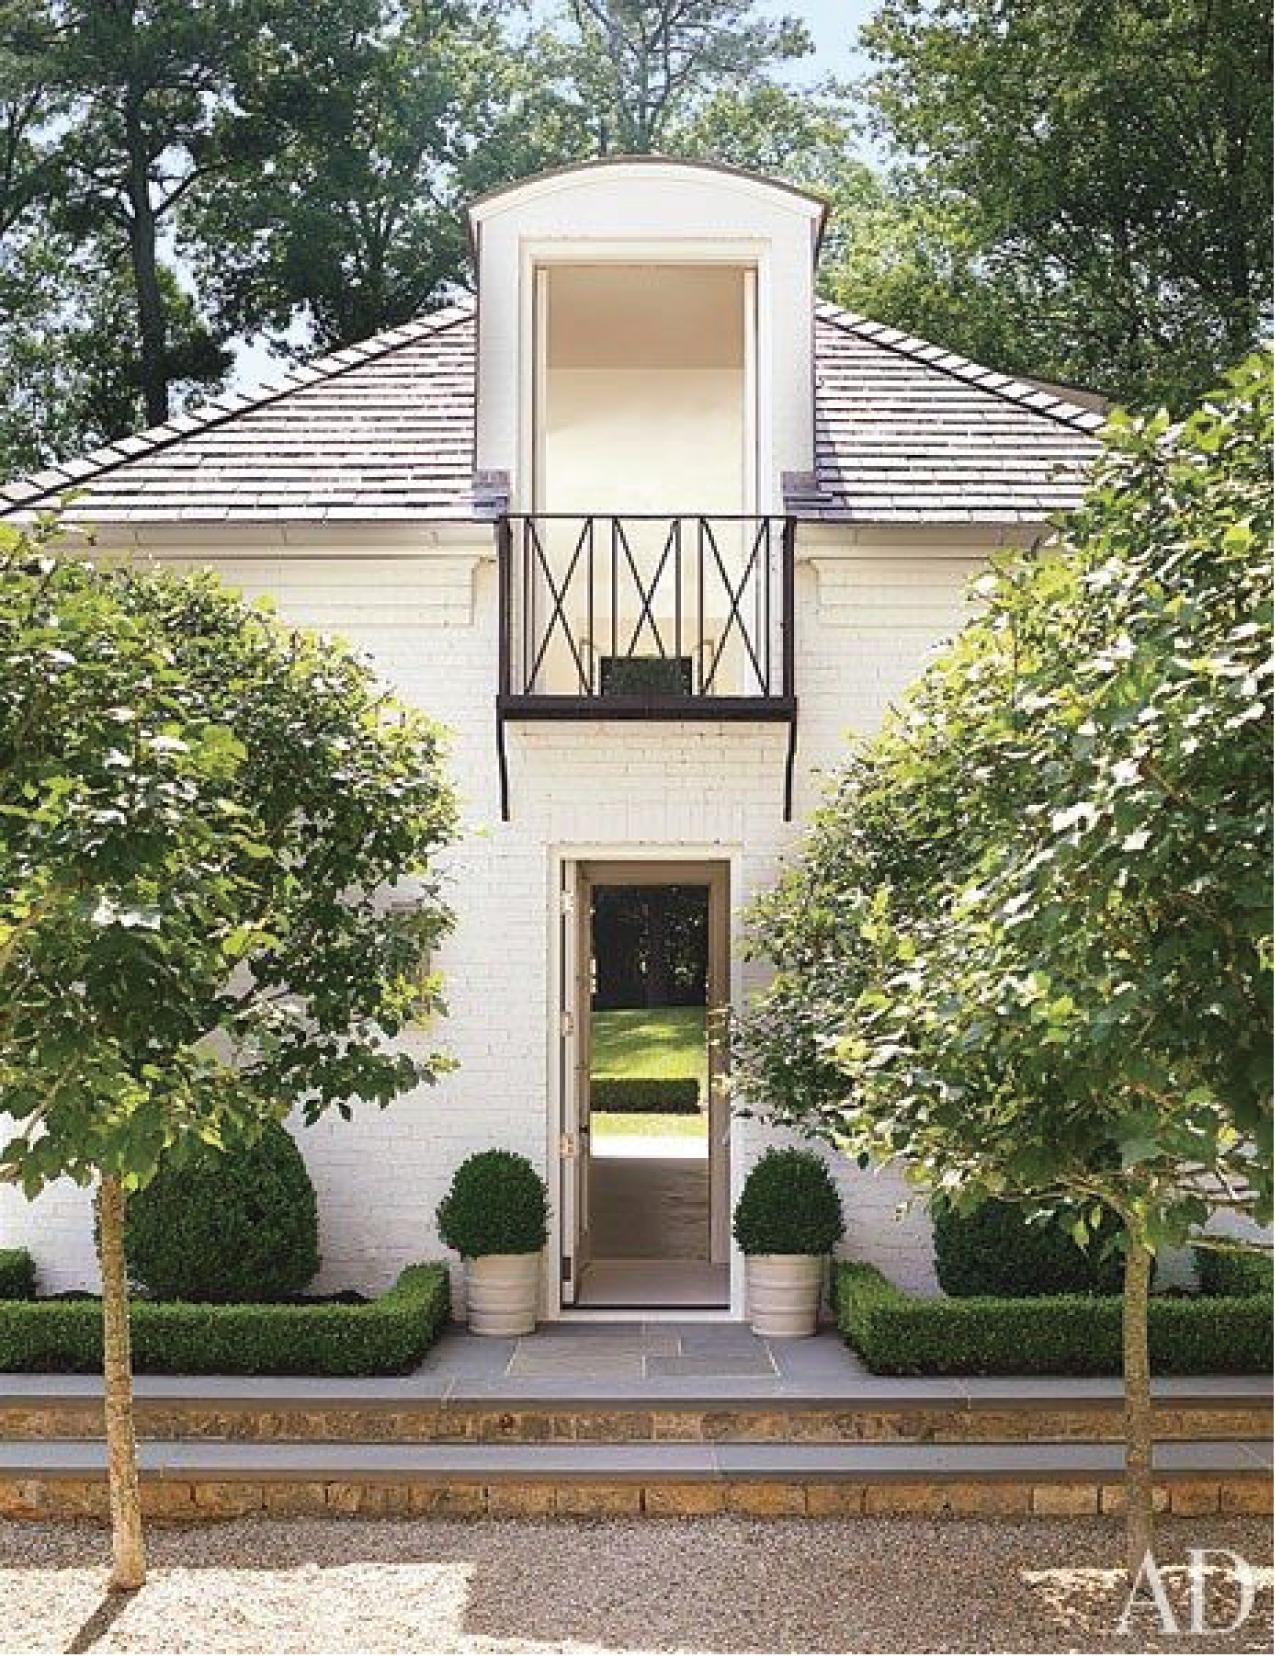 Design:  Suzanne Kasler  via  Architectural Digest